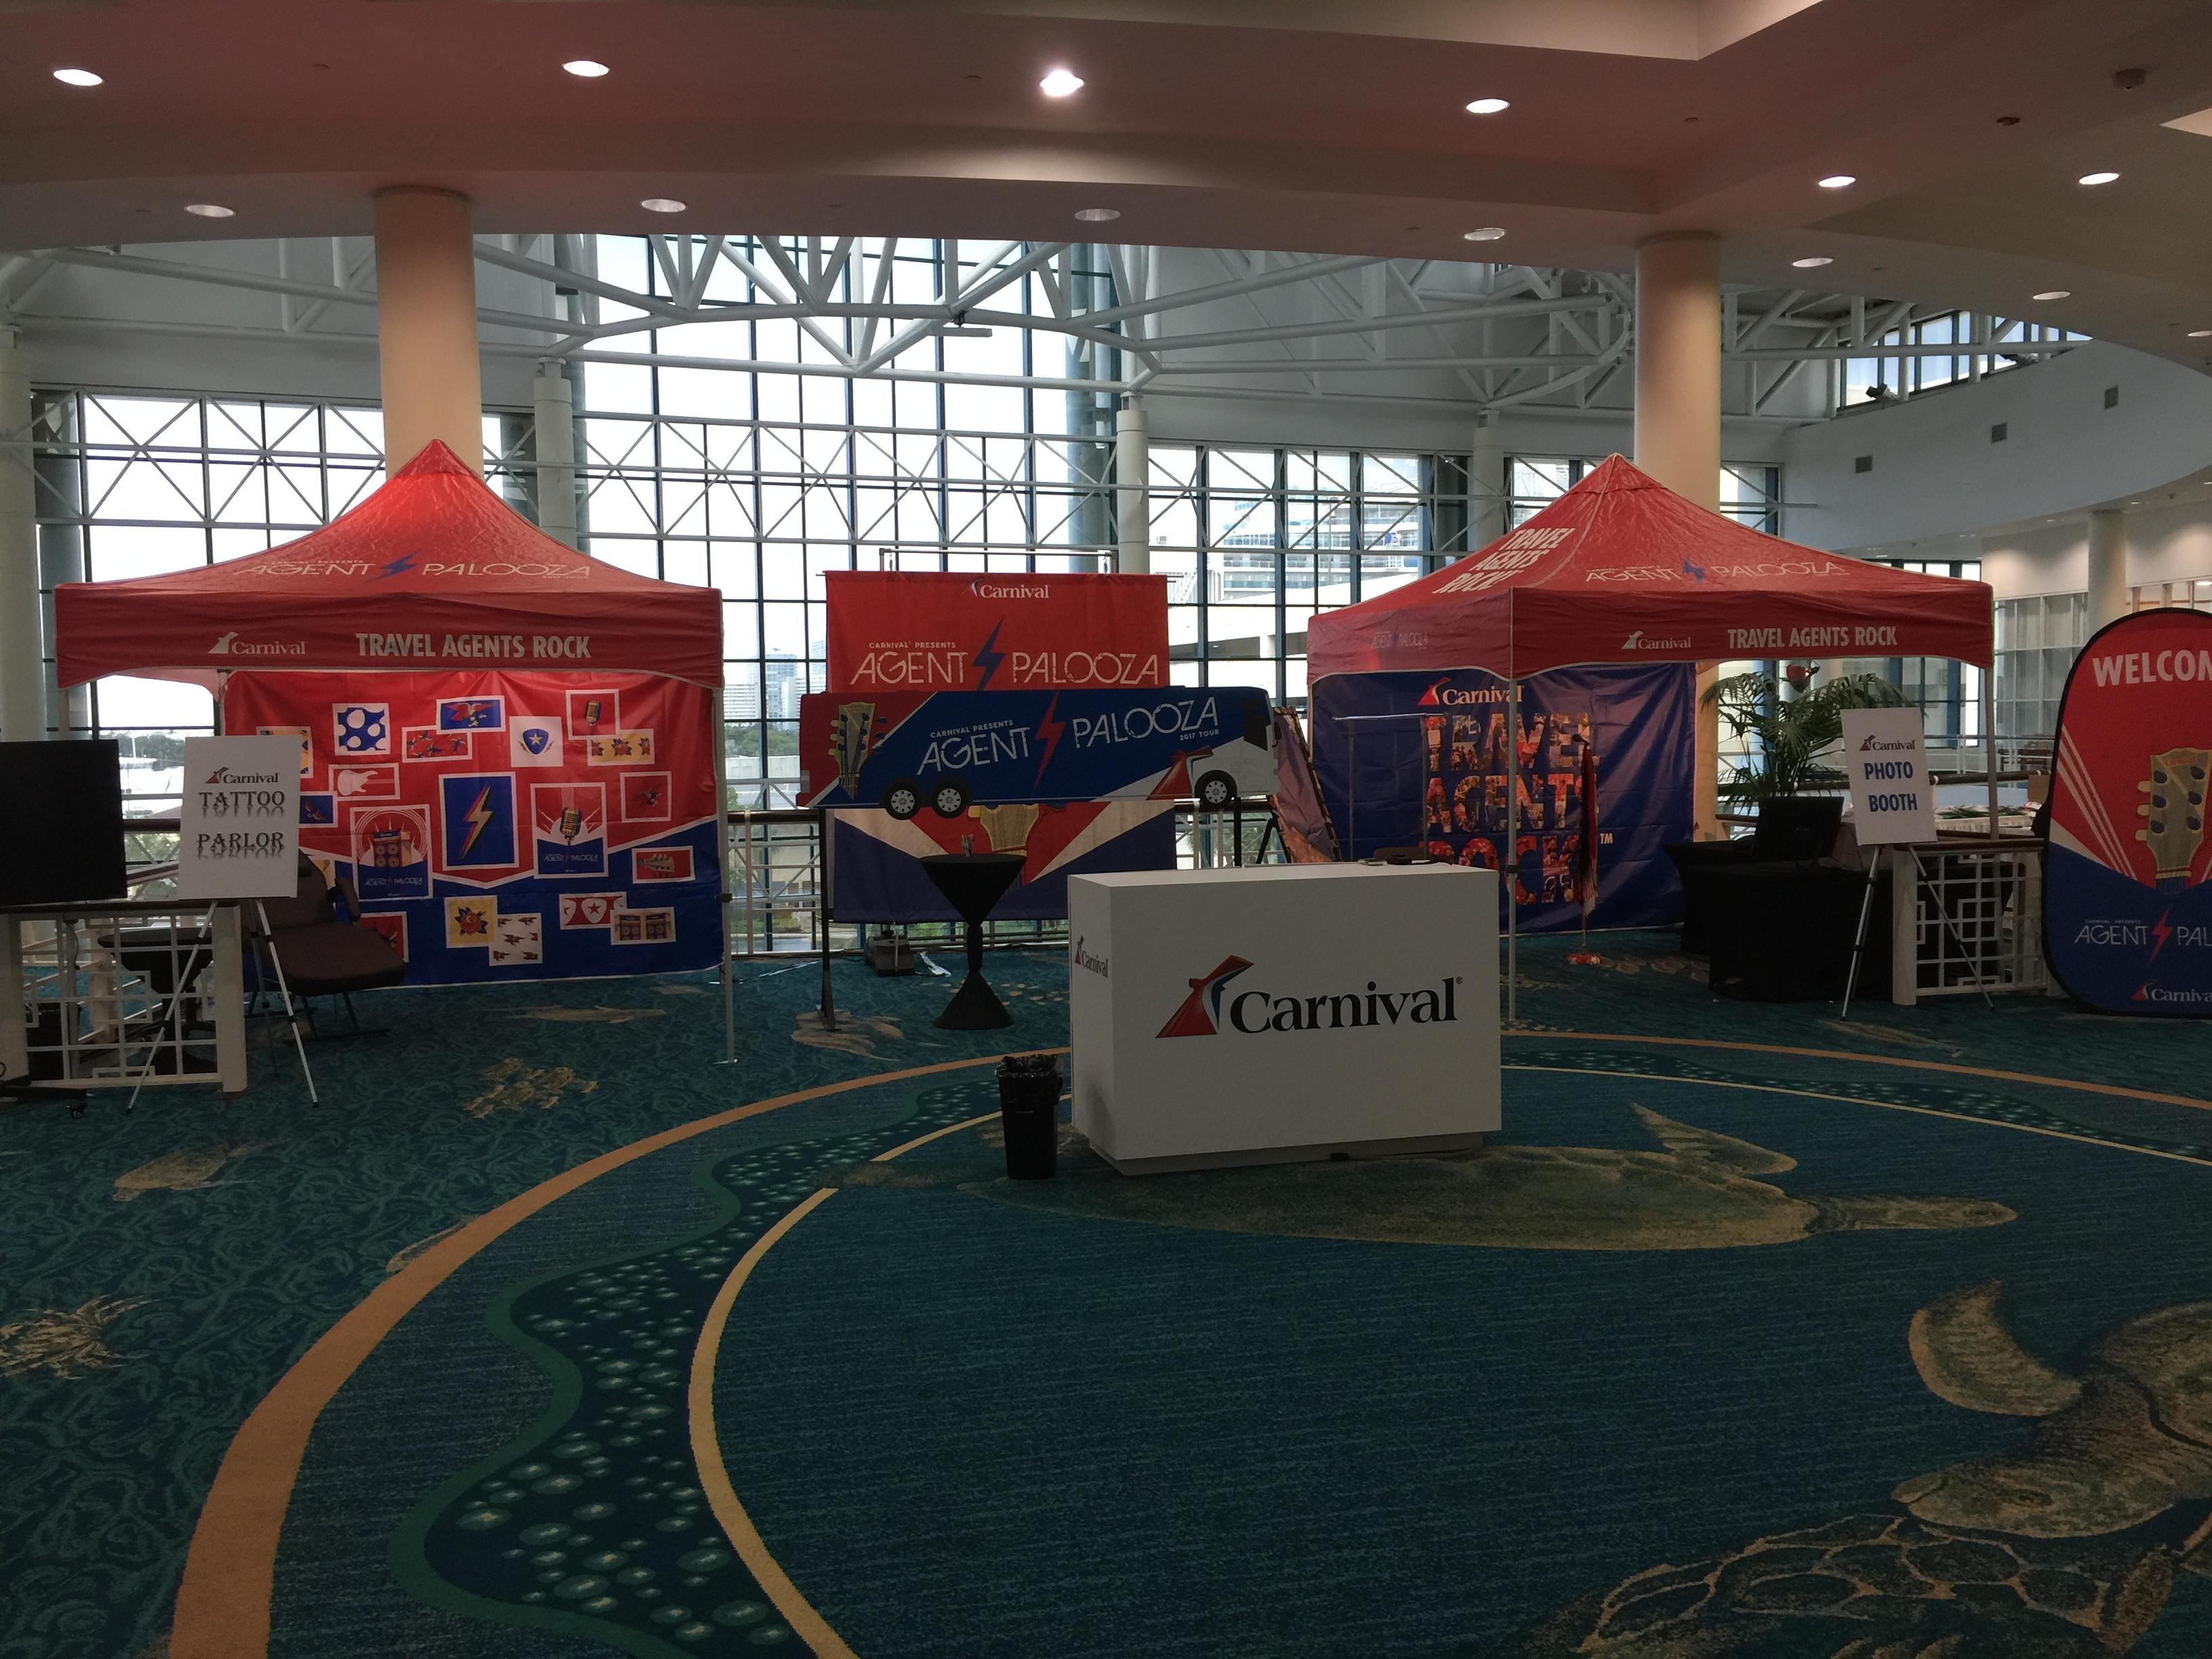 Carnival Cruise Line Brings Agentpalooza Experience to Travel Weekly CruiseWorld